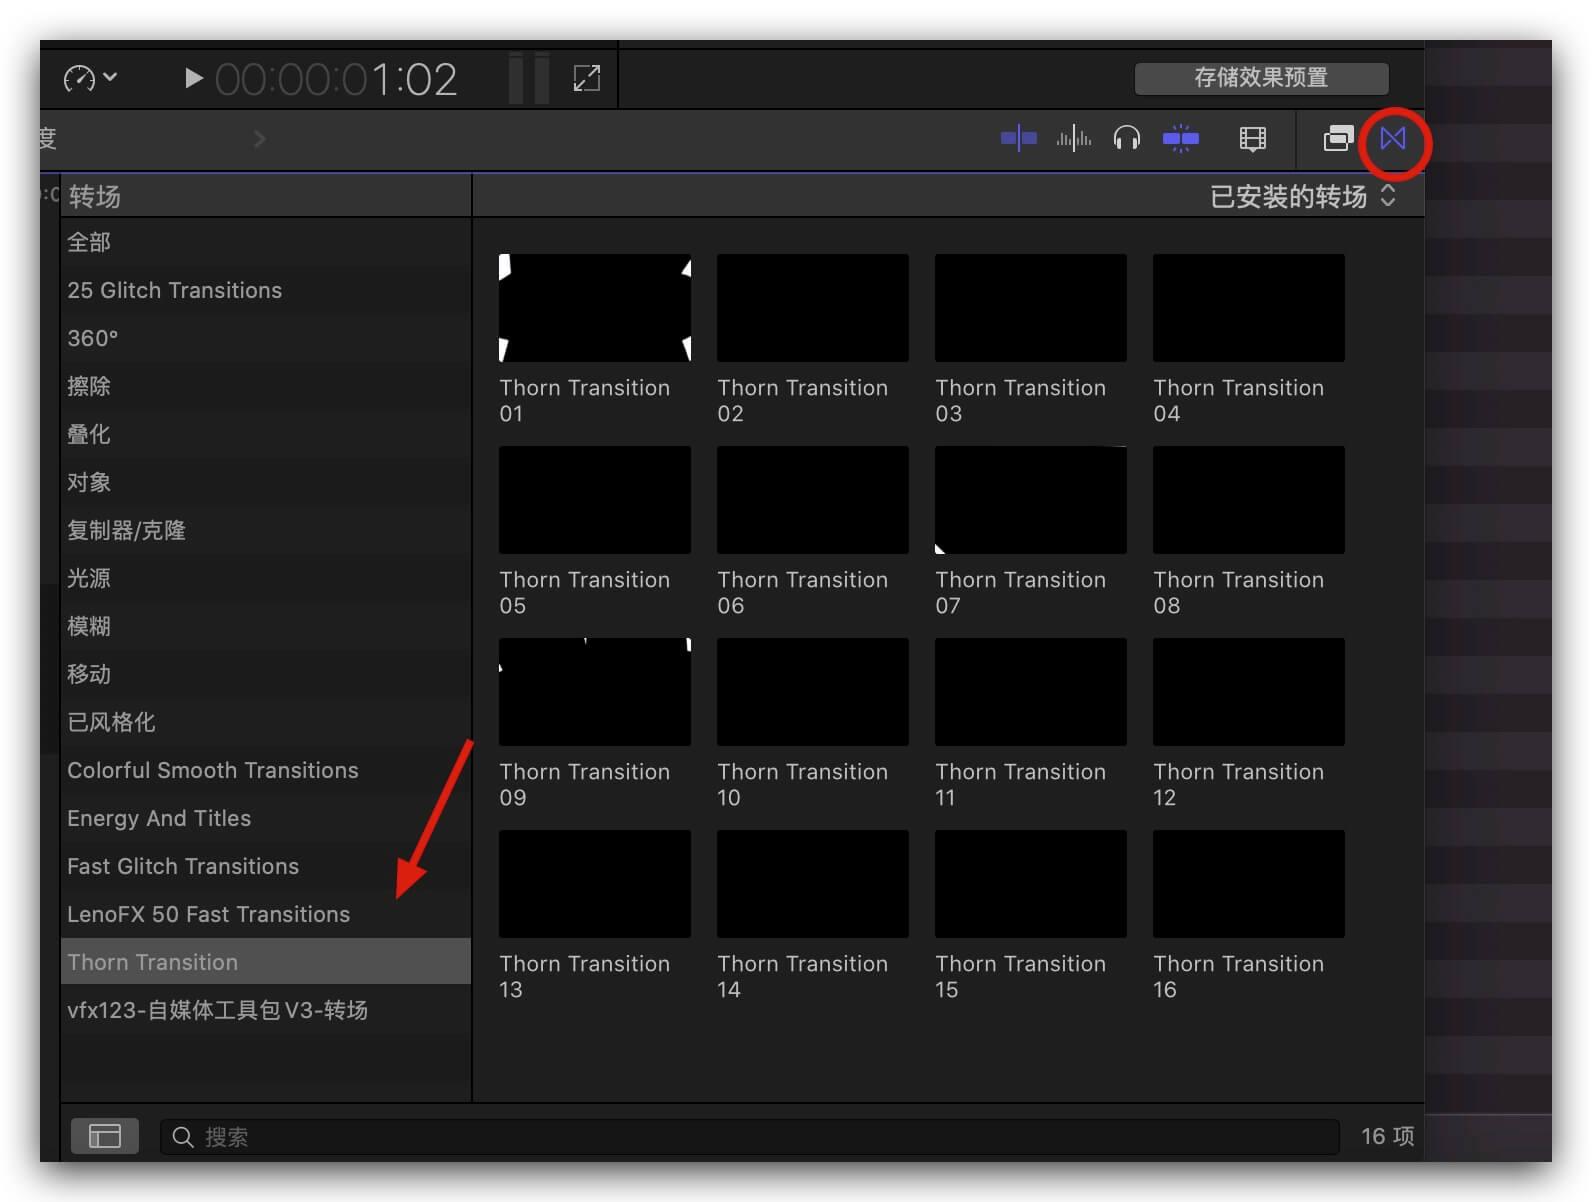 Fcpx转场插件 16组手绘卡通毛刺效果过渡转场预设 Thorn Transitions